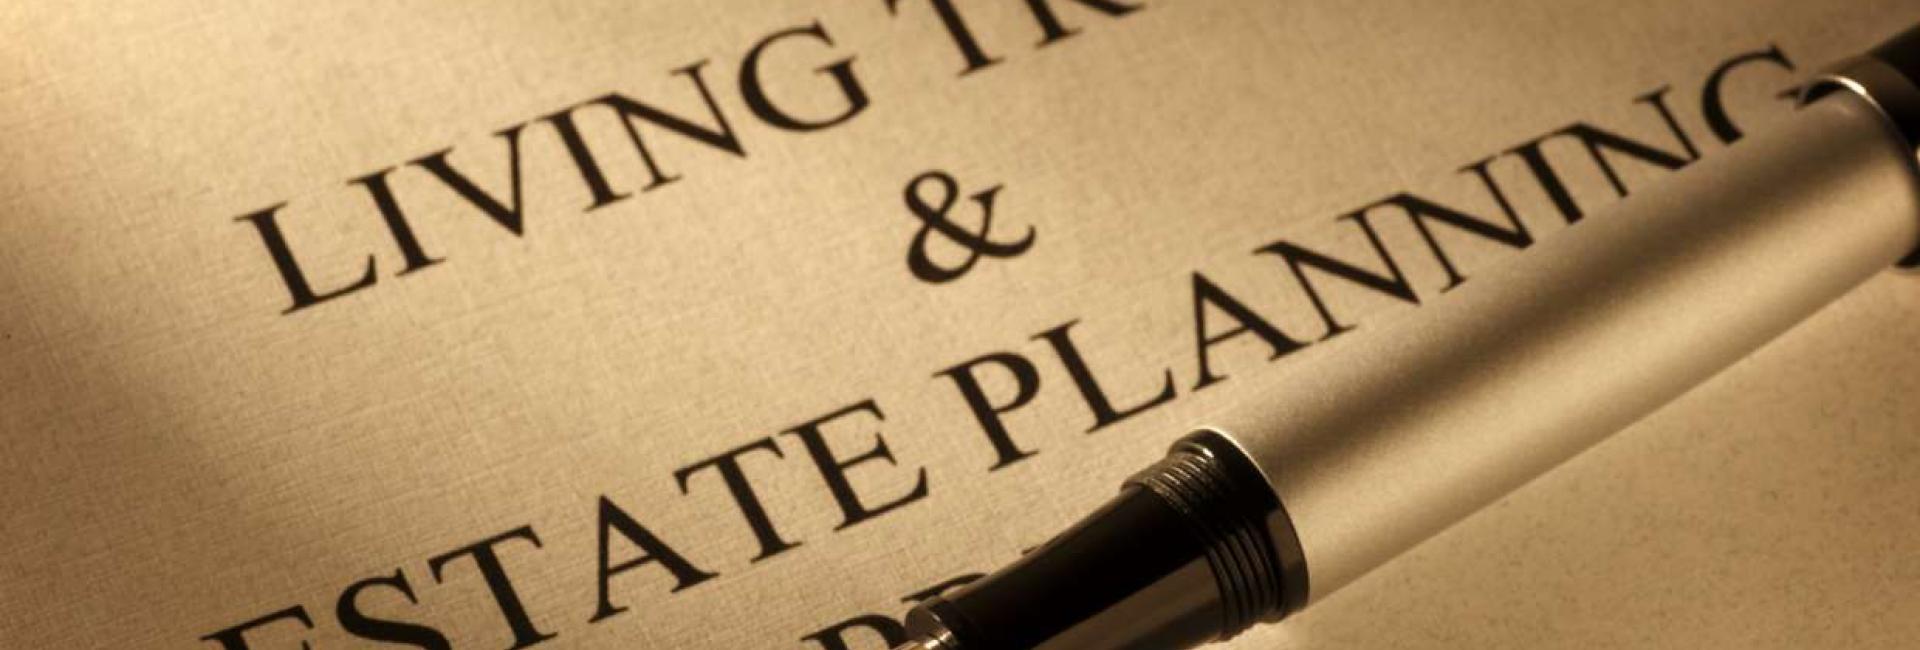 Wills, Trusts, & Probate